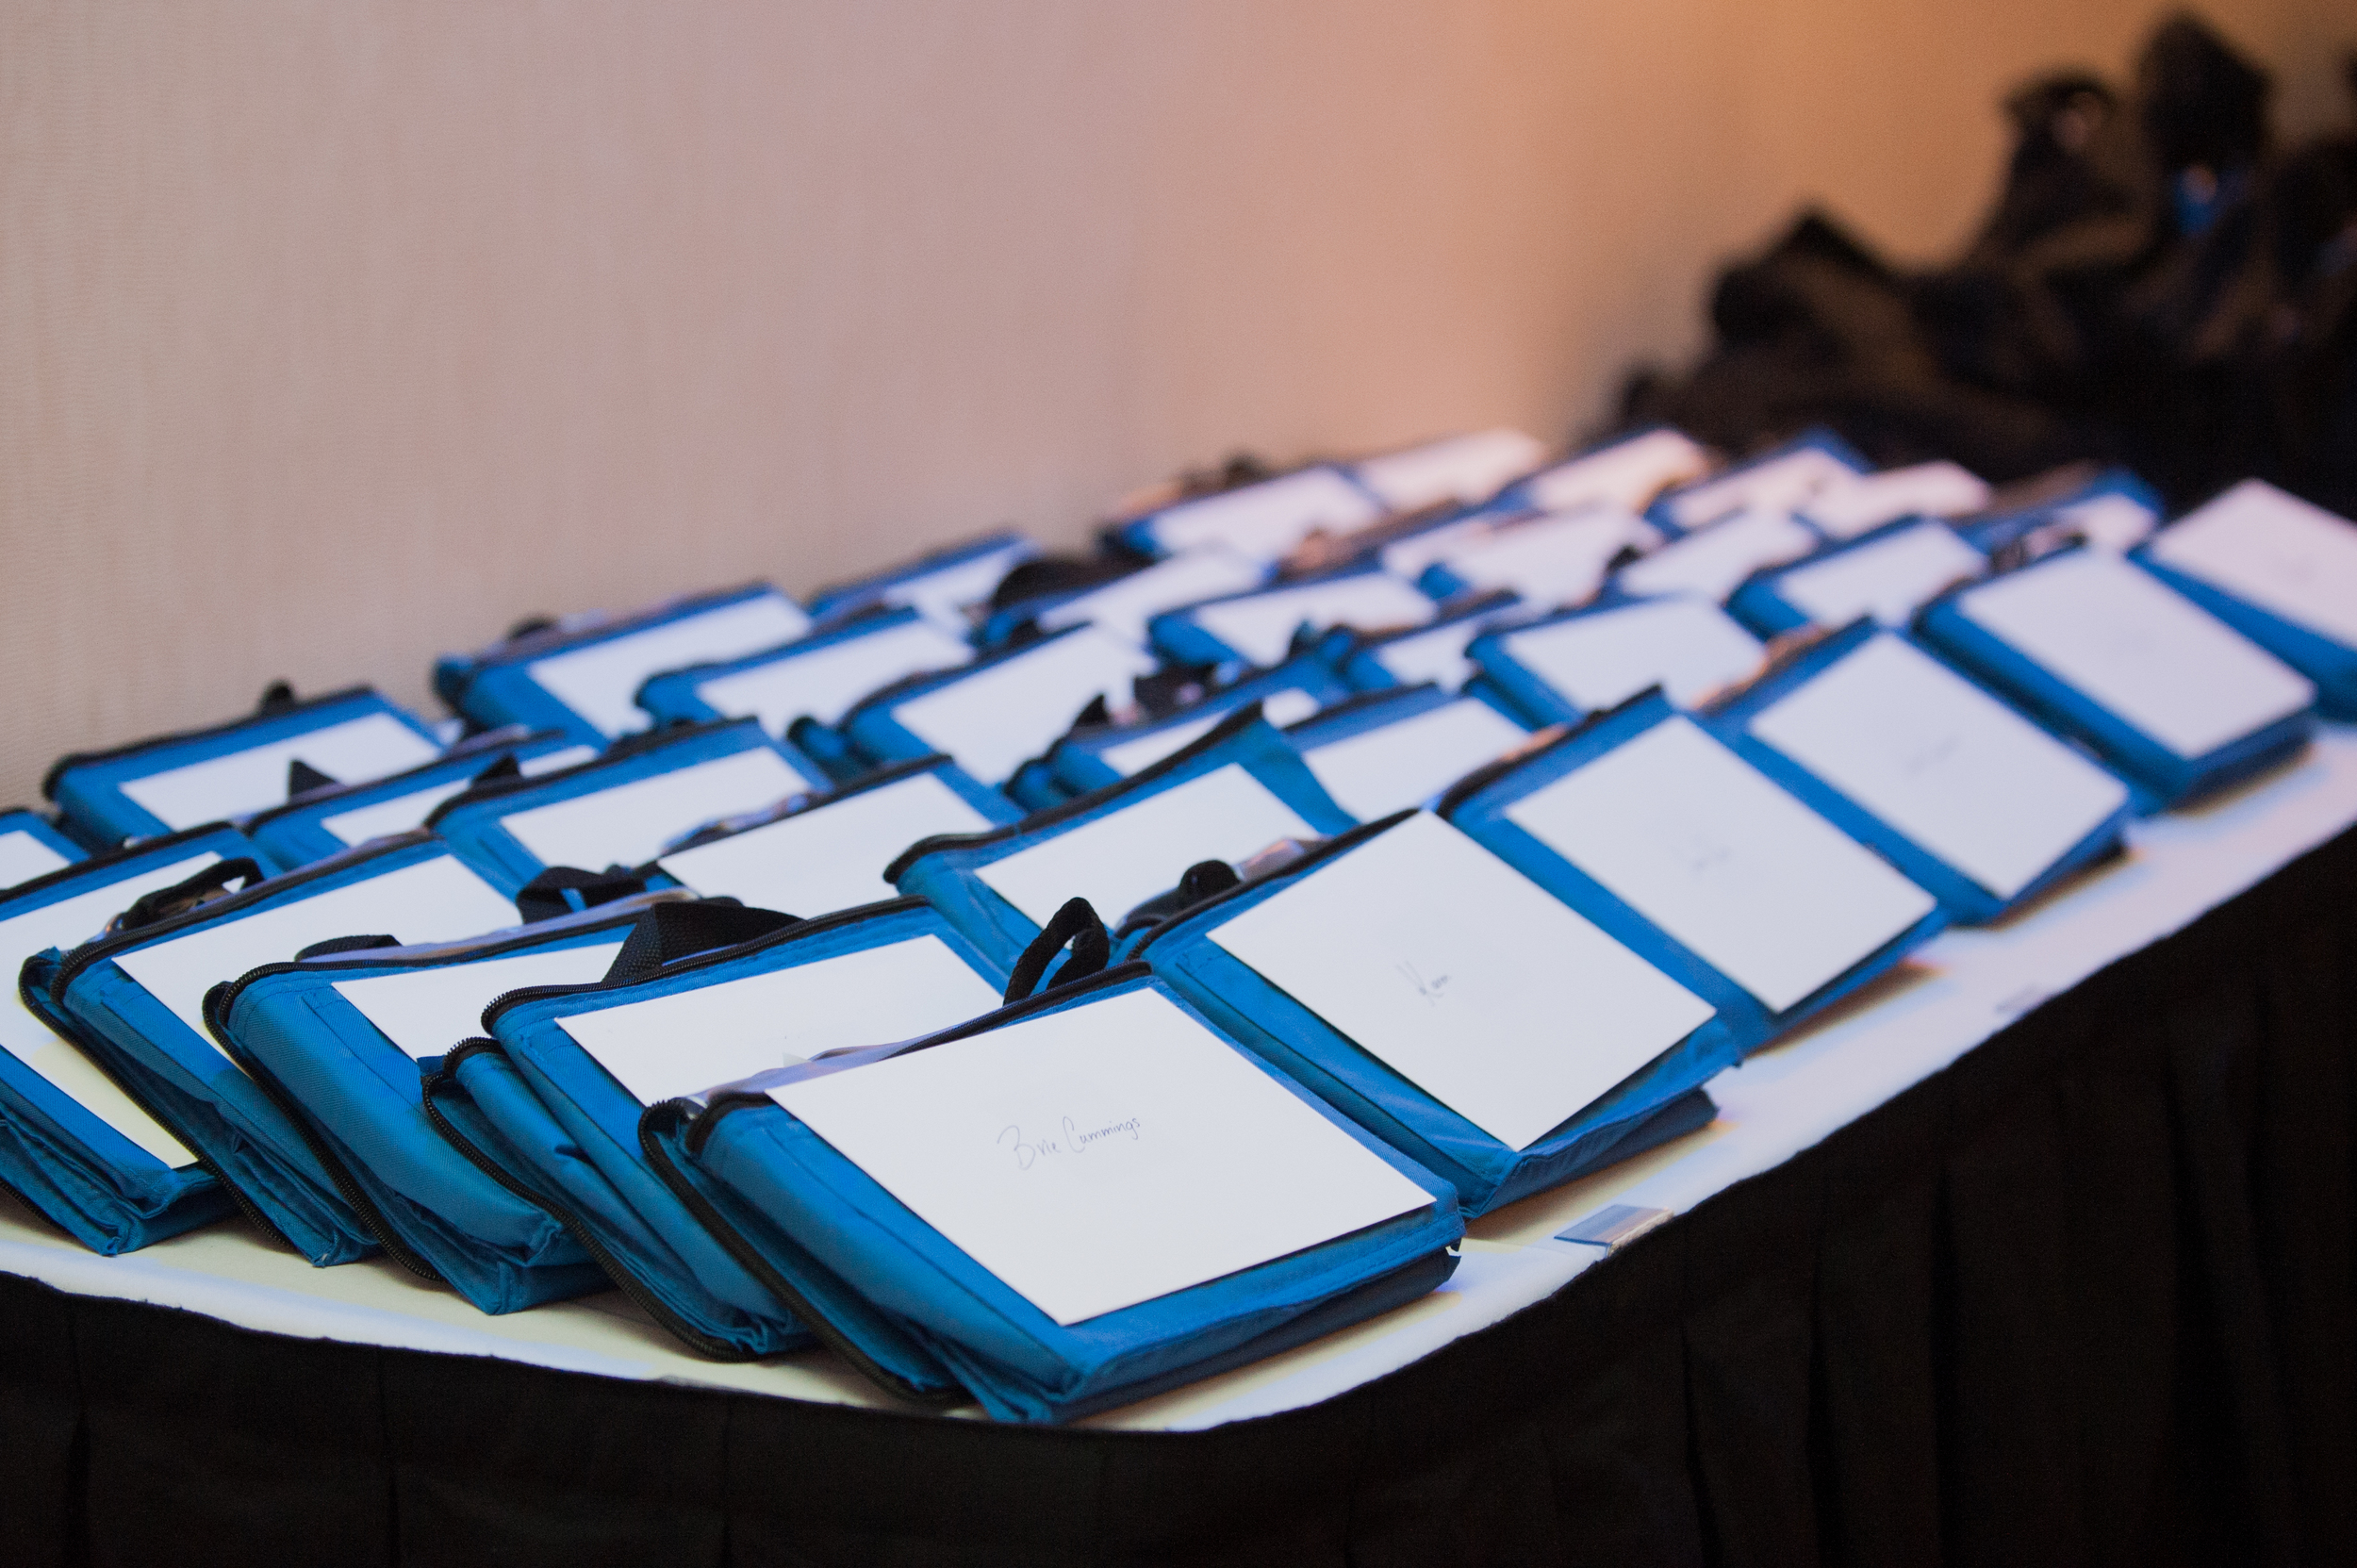 2014-11-15-ABACS Annual Dinner-39.jpg